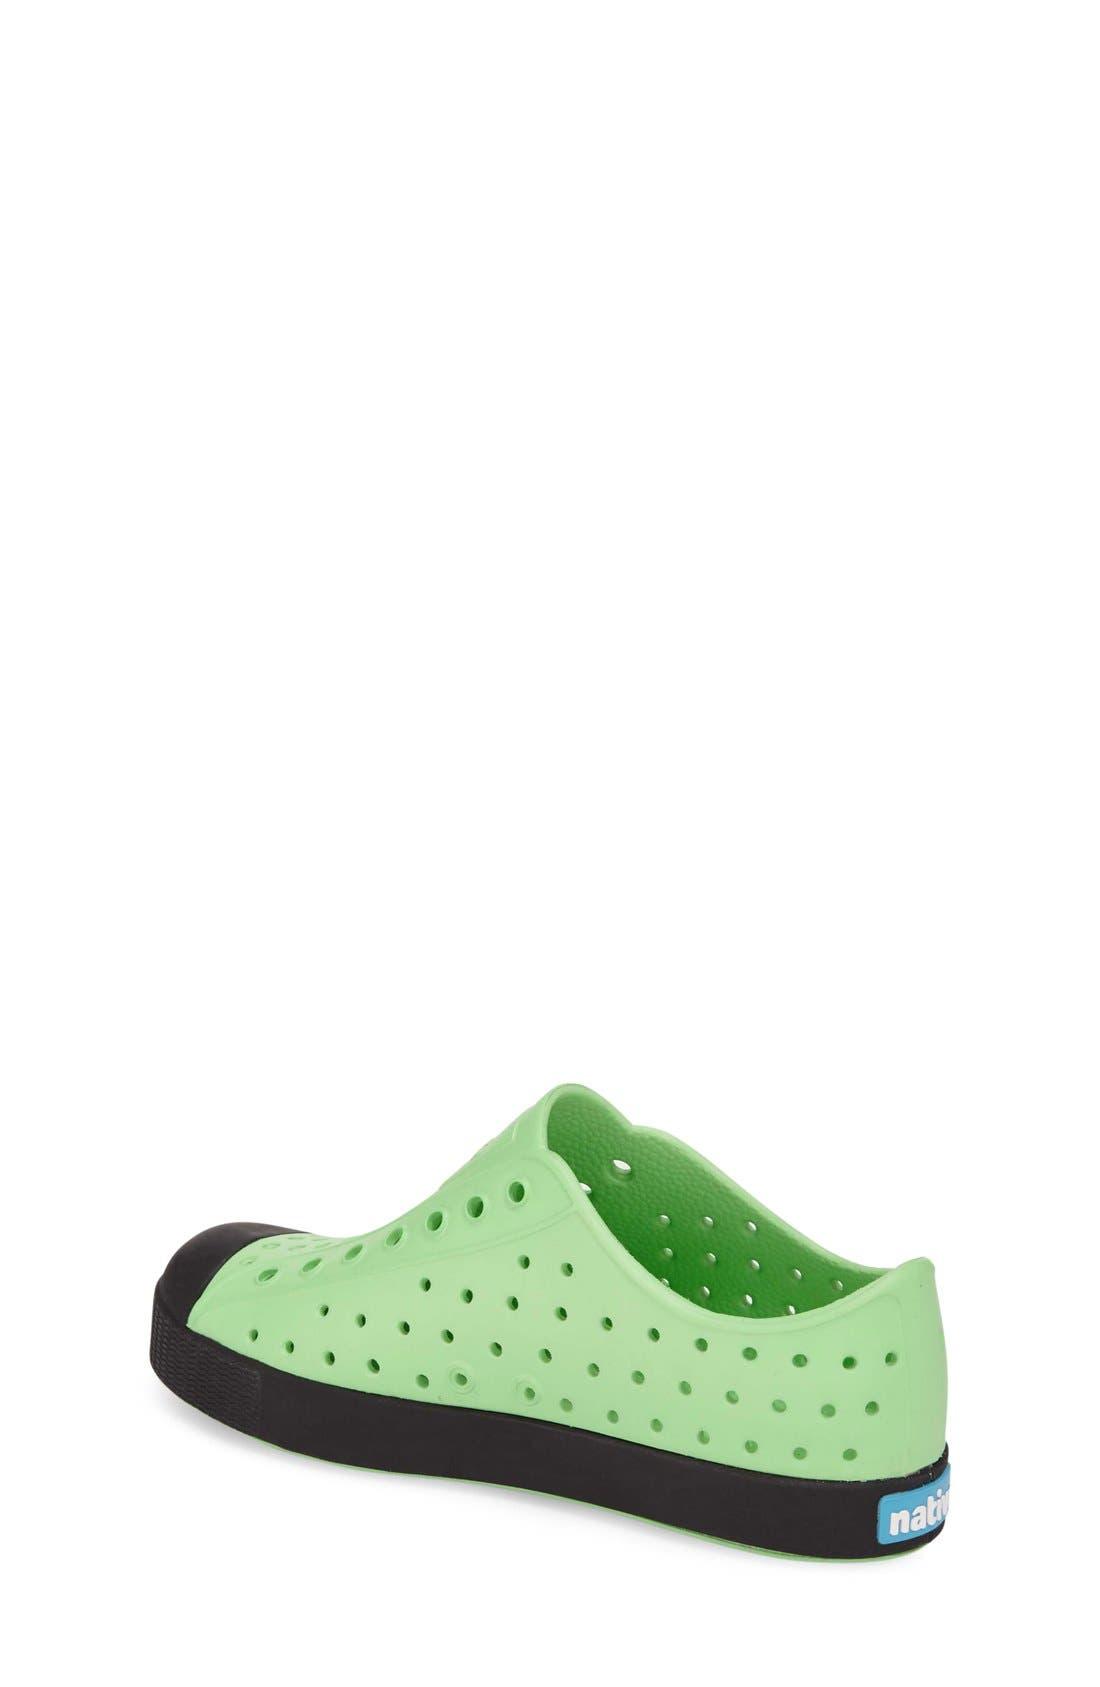 'Jefferson' Water Friendly Slip-On Sneaker,                             Alternate thumbnail 96, color,